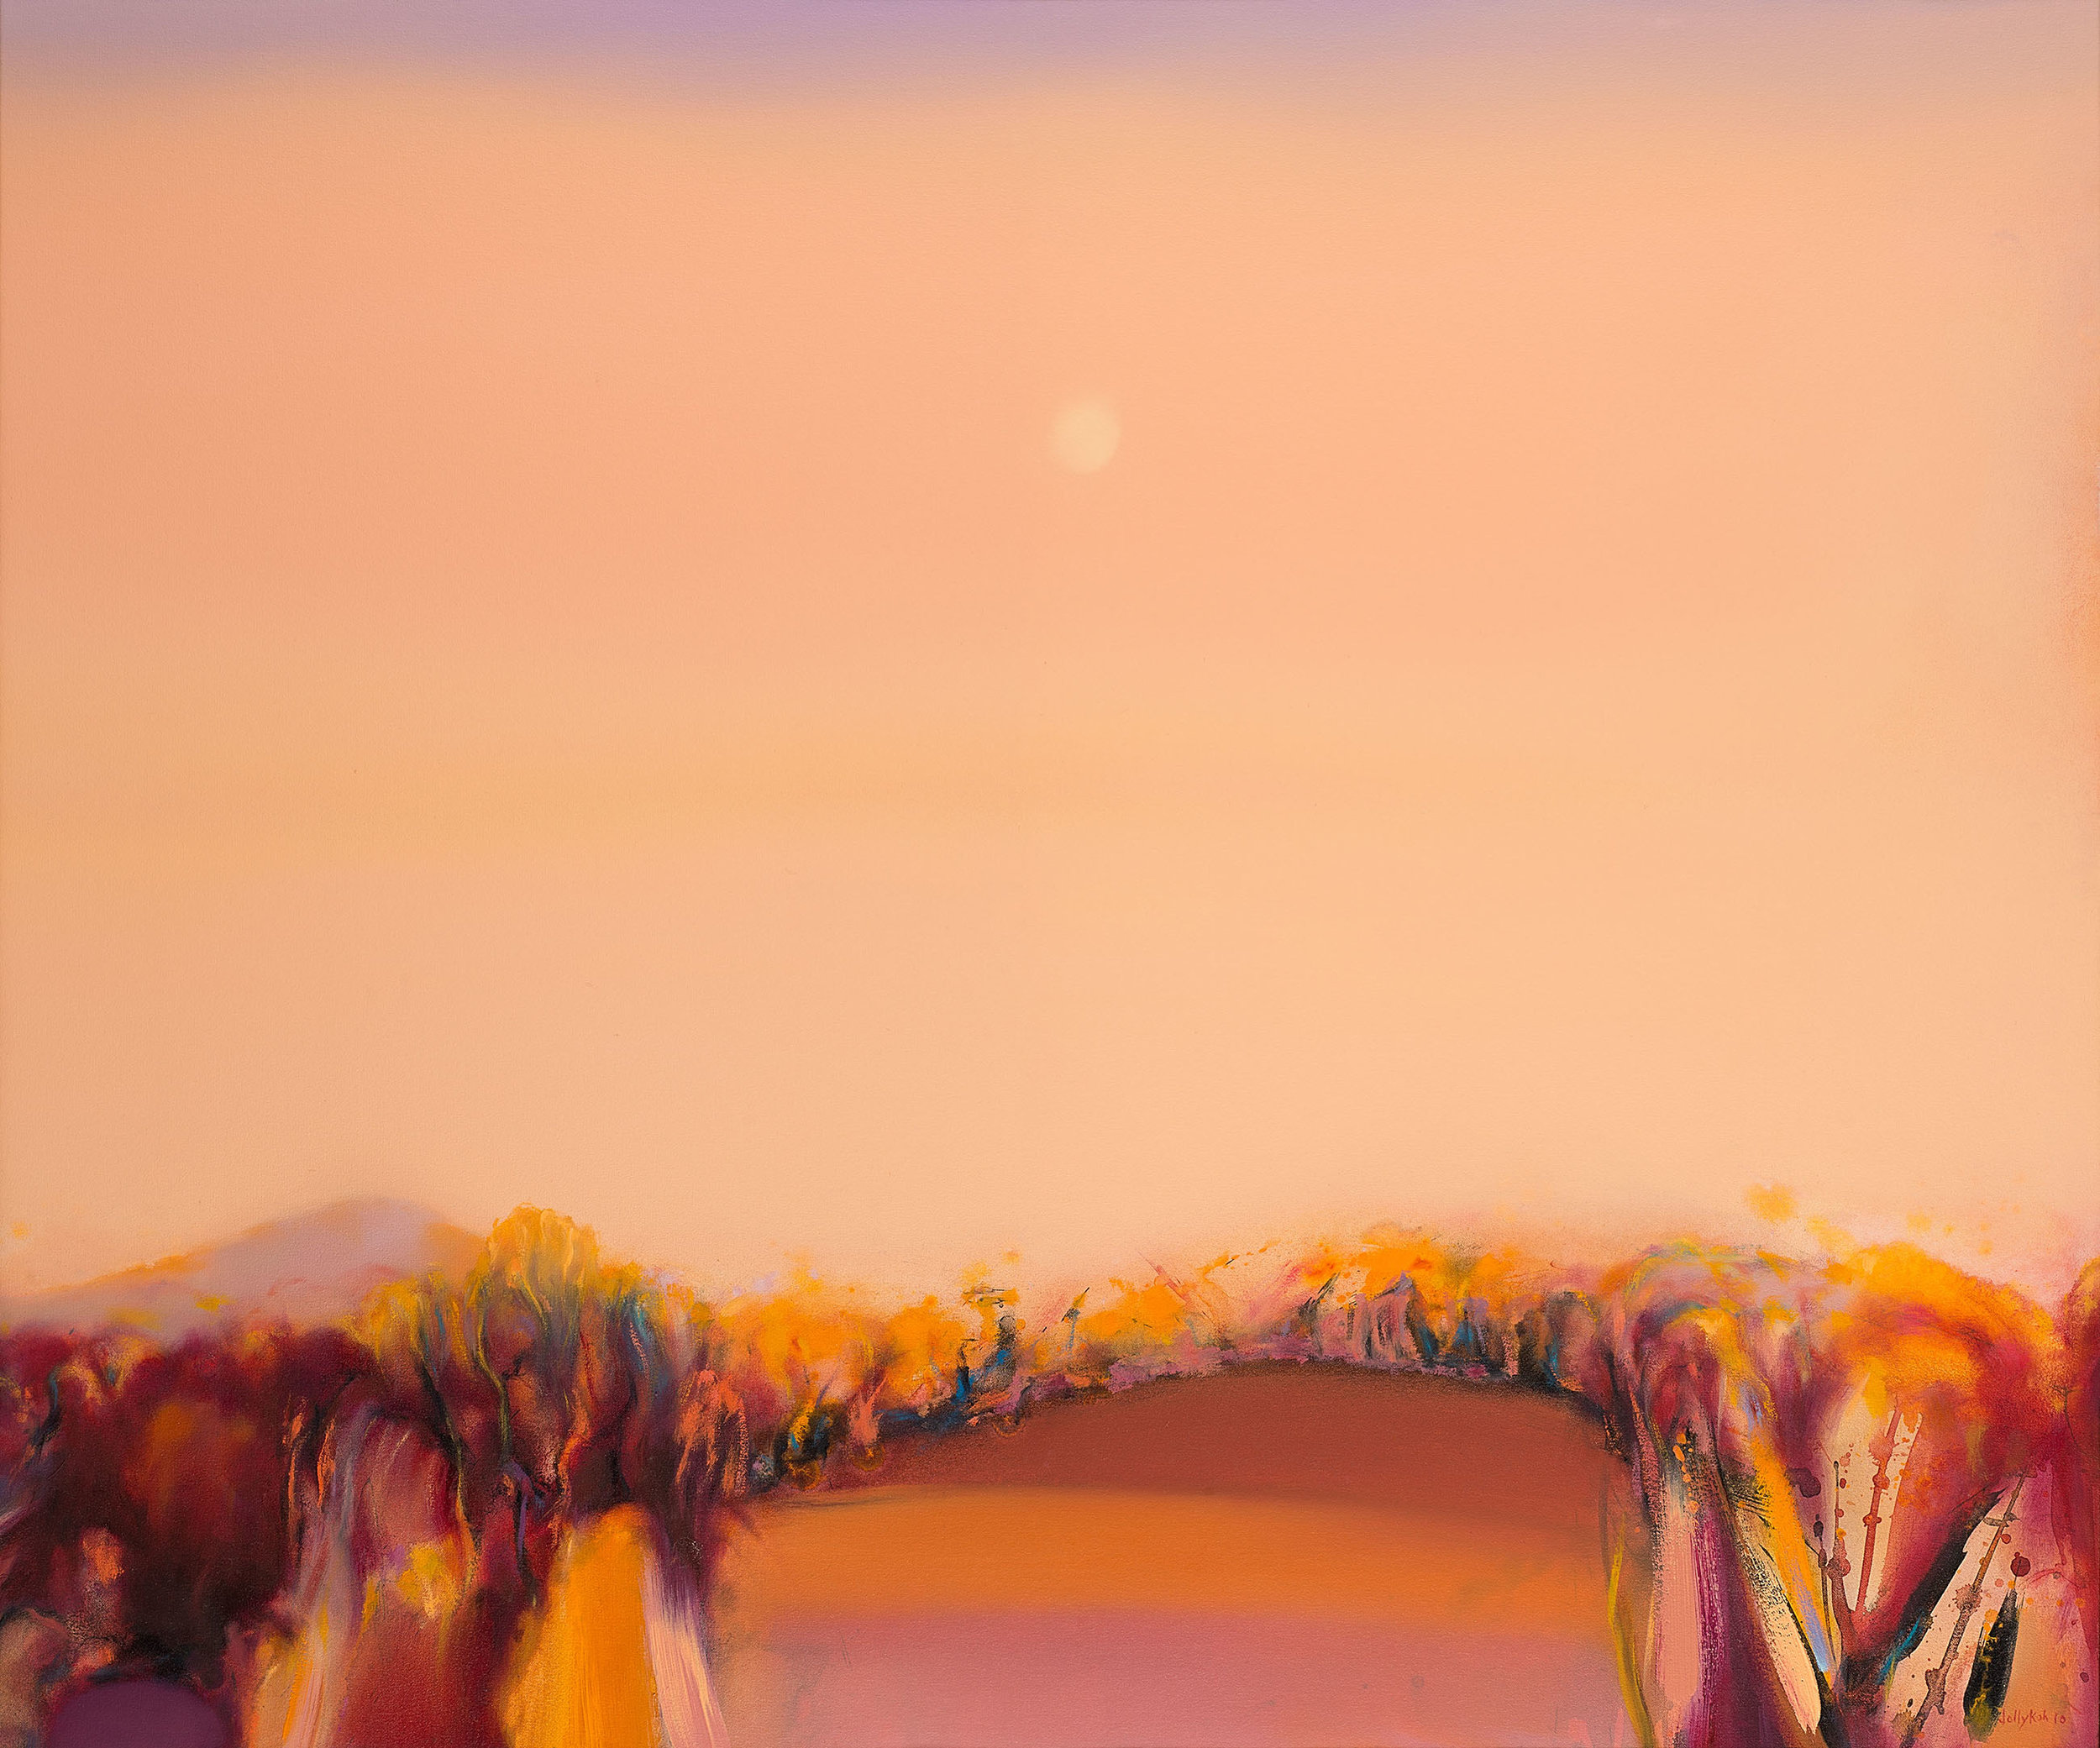 Autumn Landscape, II